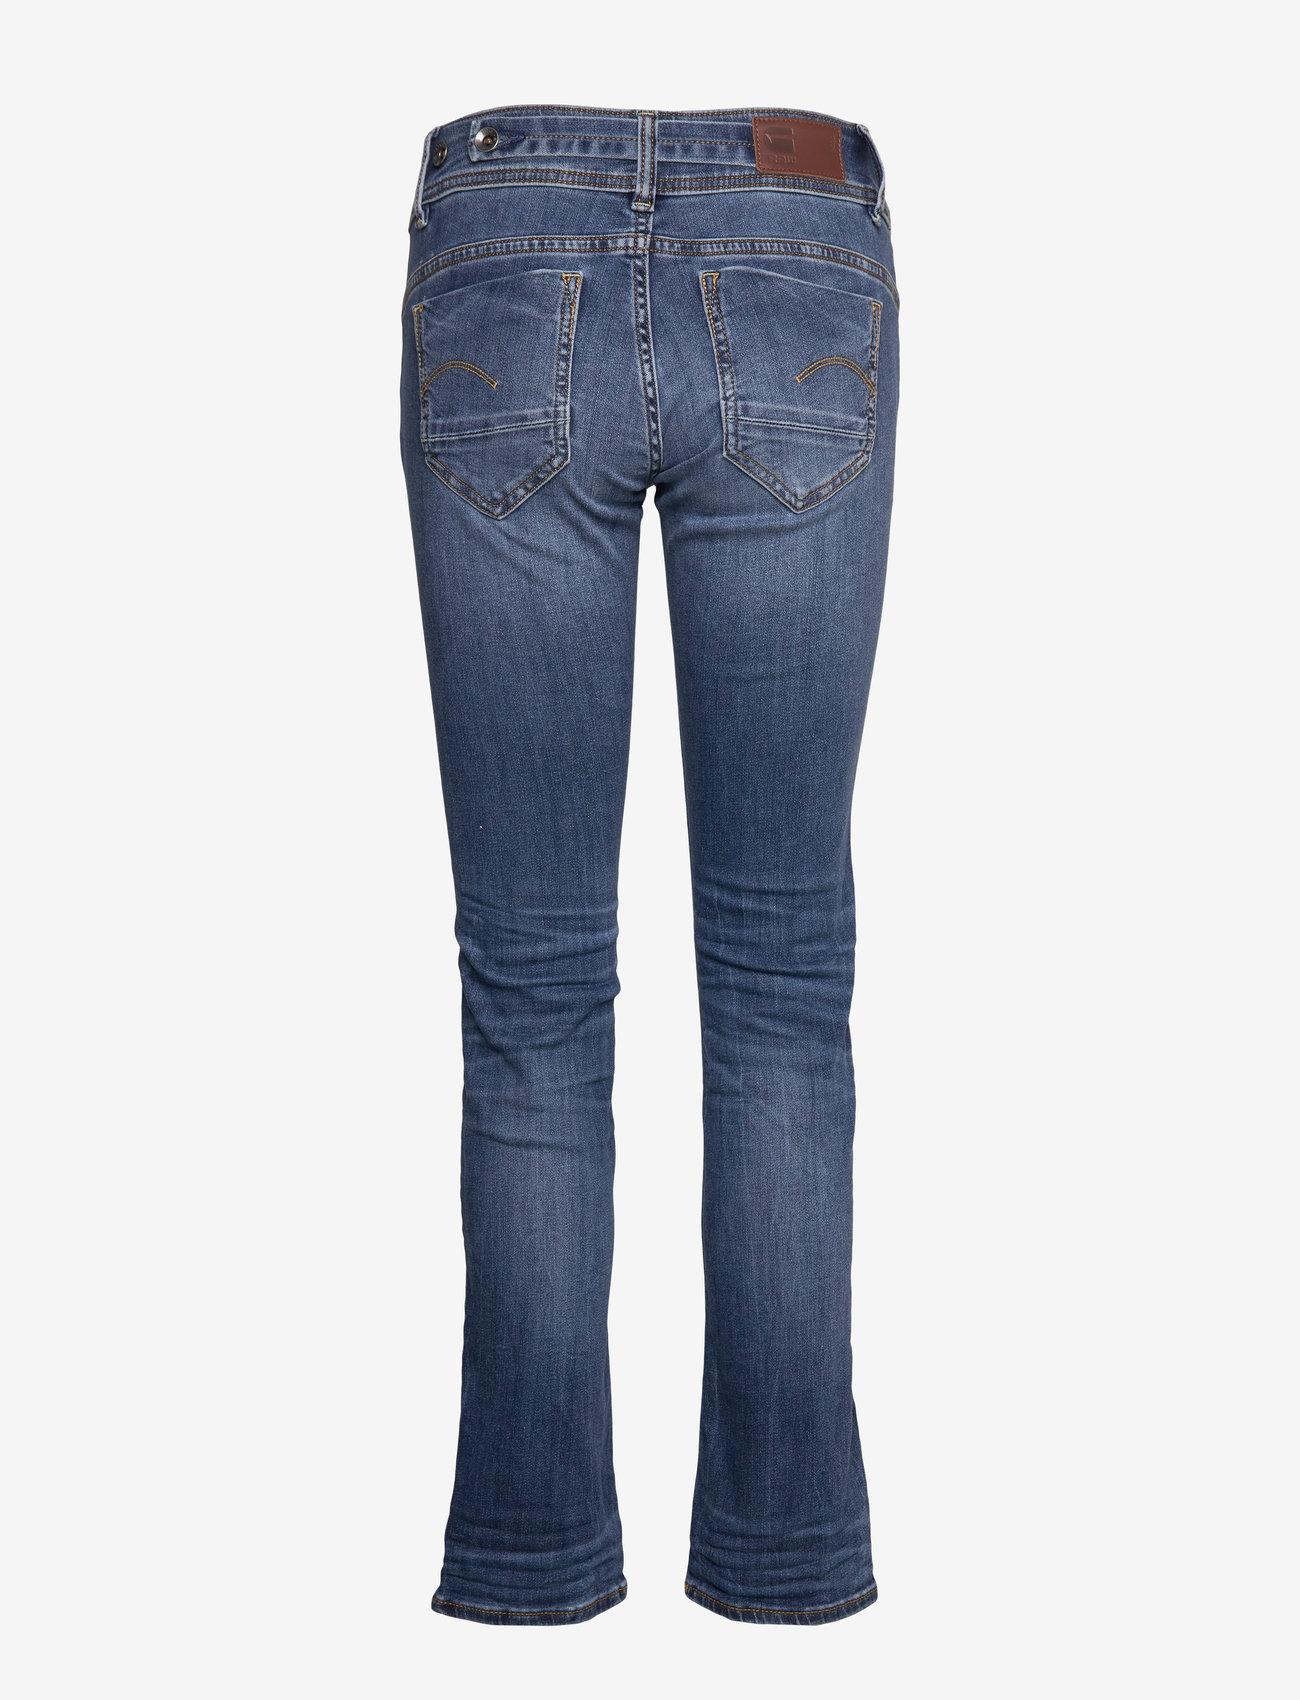 G-star RAW - Midge Mid Straight Wmn - straight jeans - medium indigo aged - 1